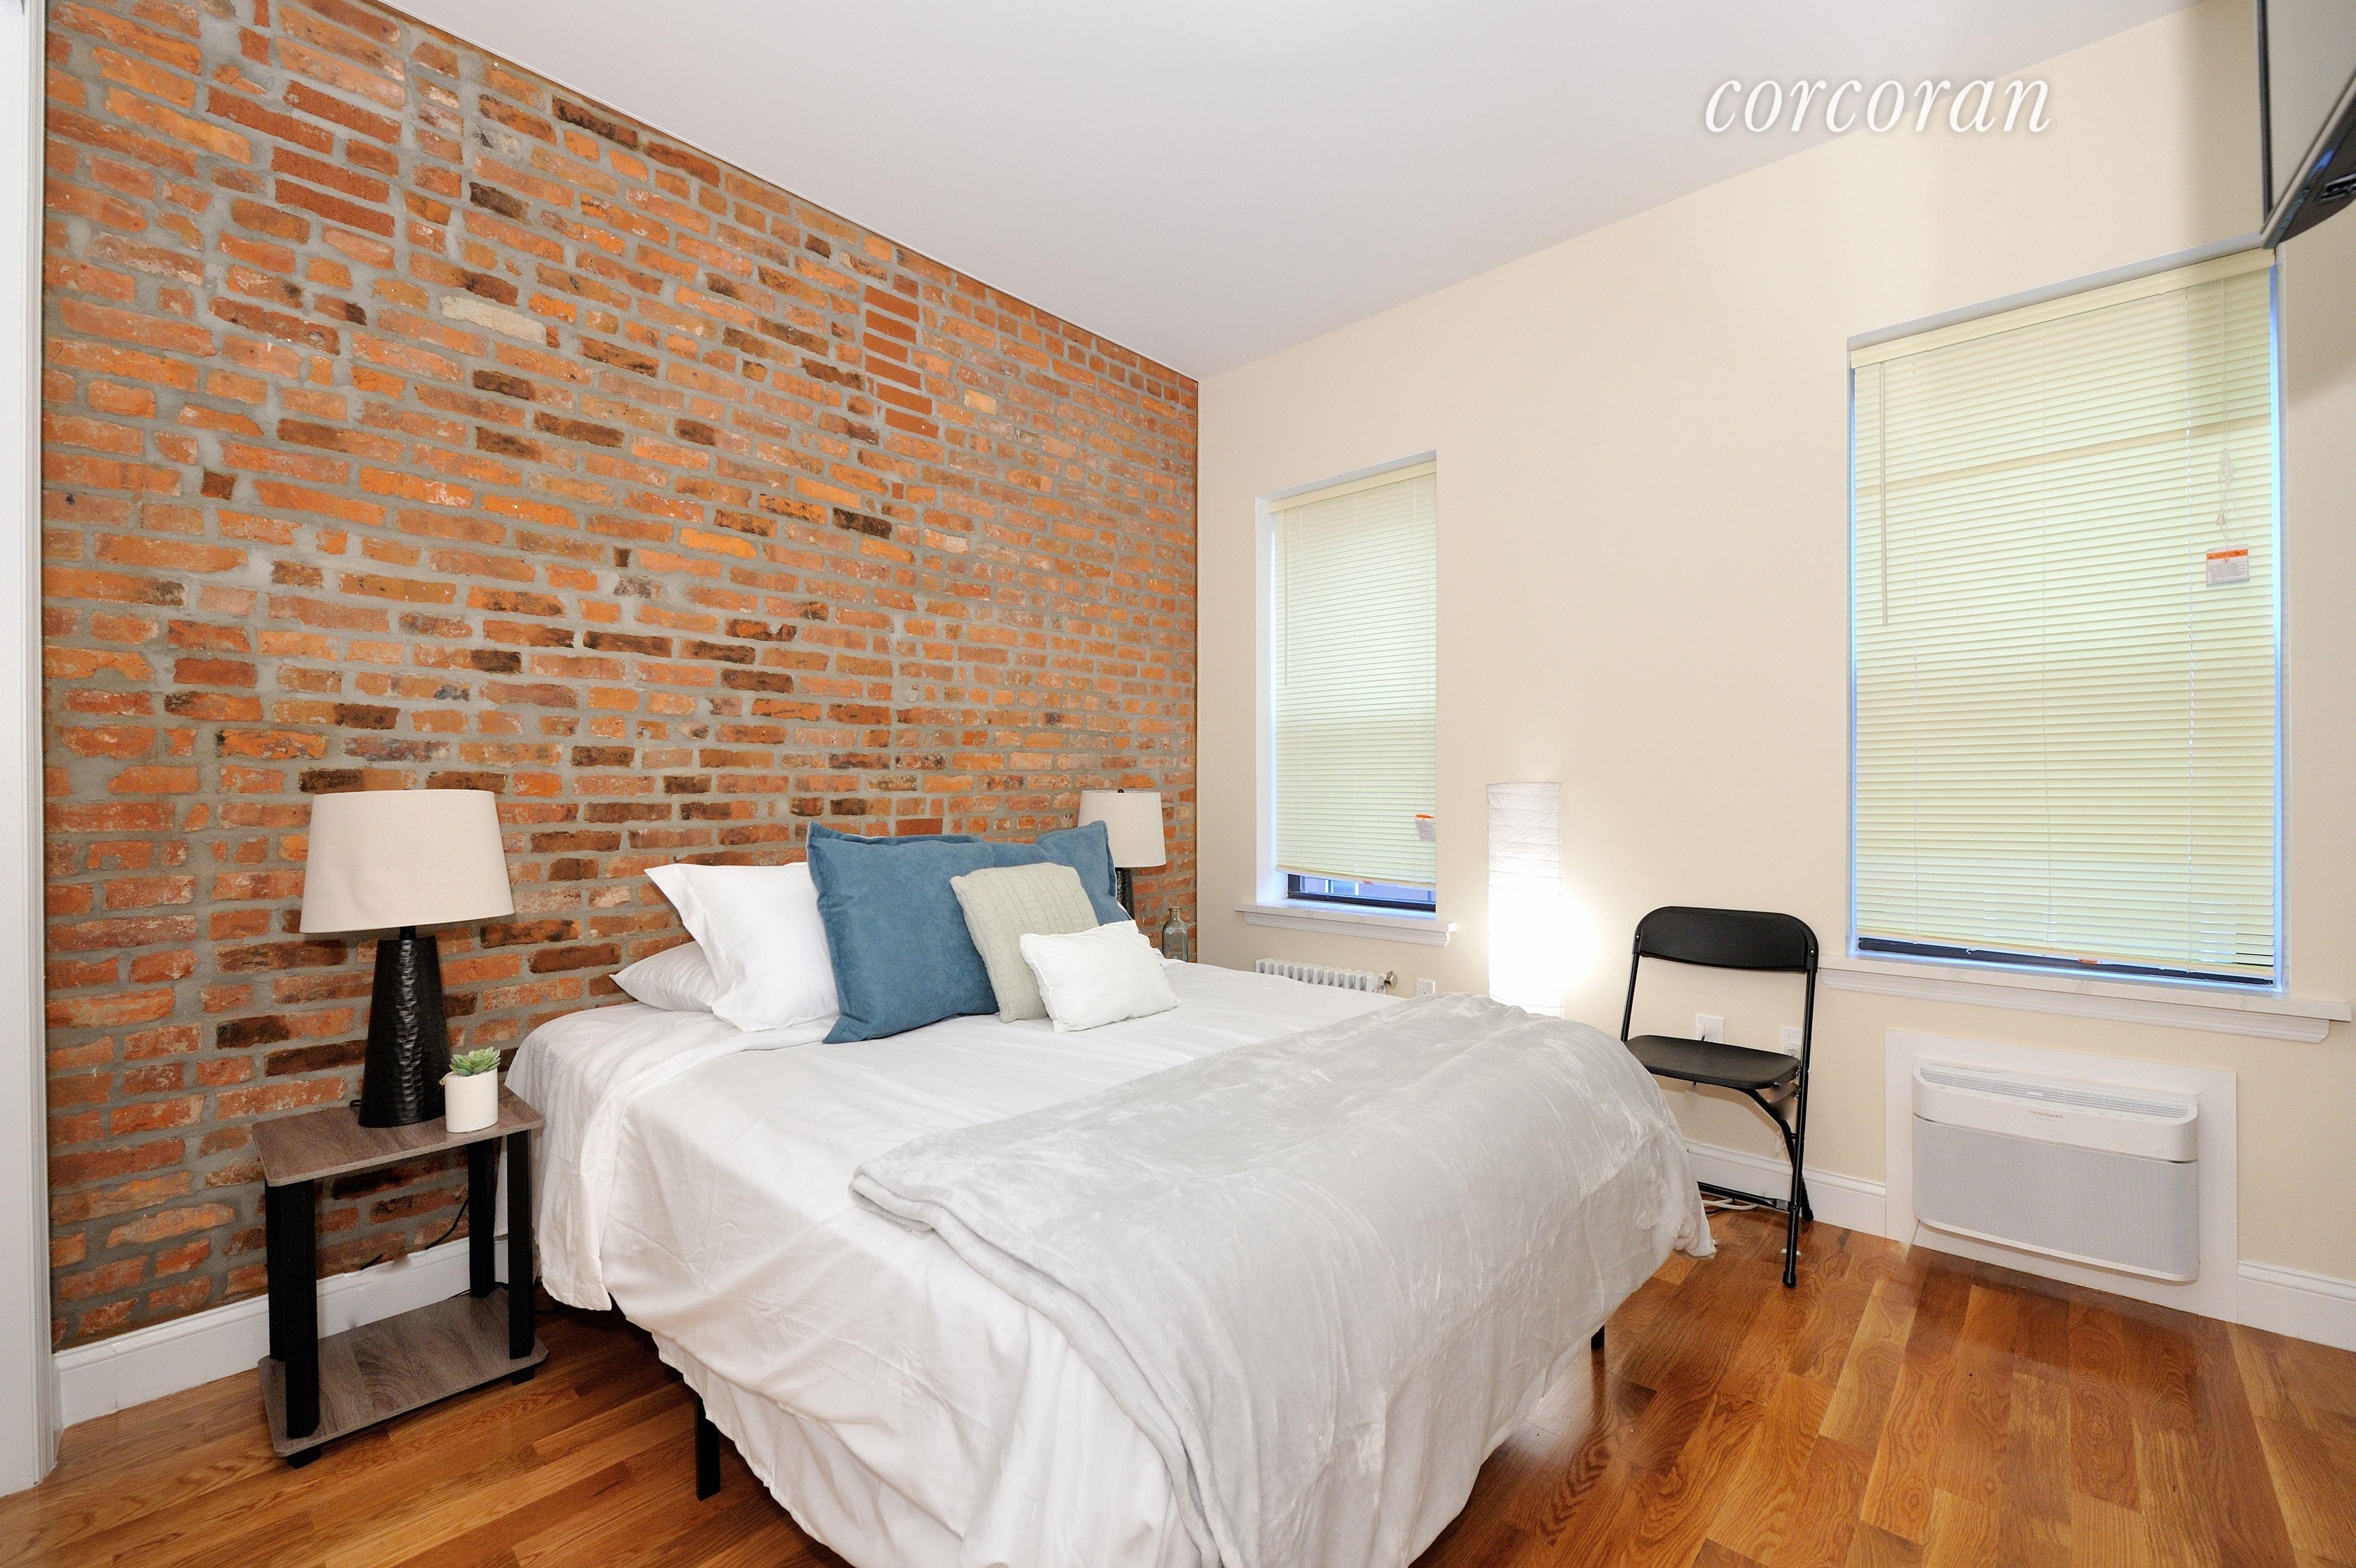 237 Sullivan Street, Apt 3-F, Manhattan, New York 10013